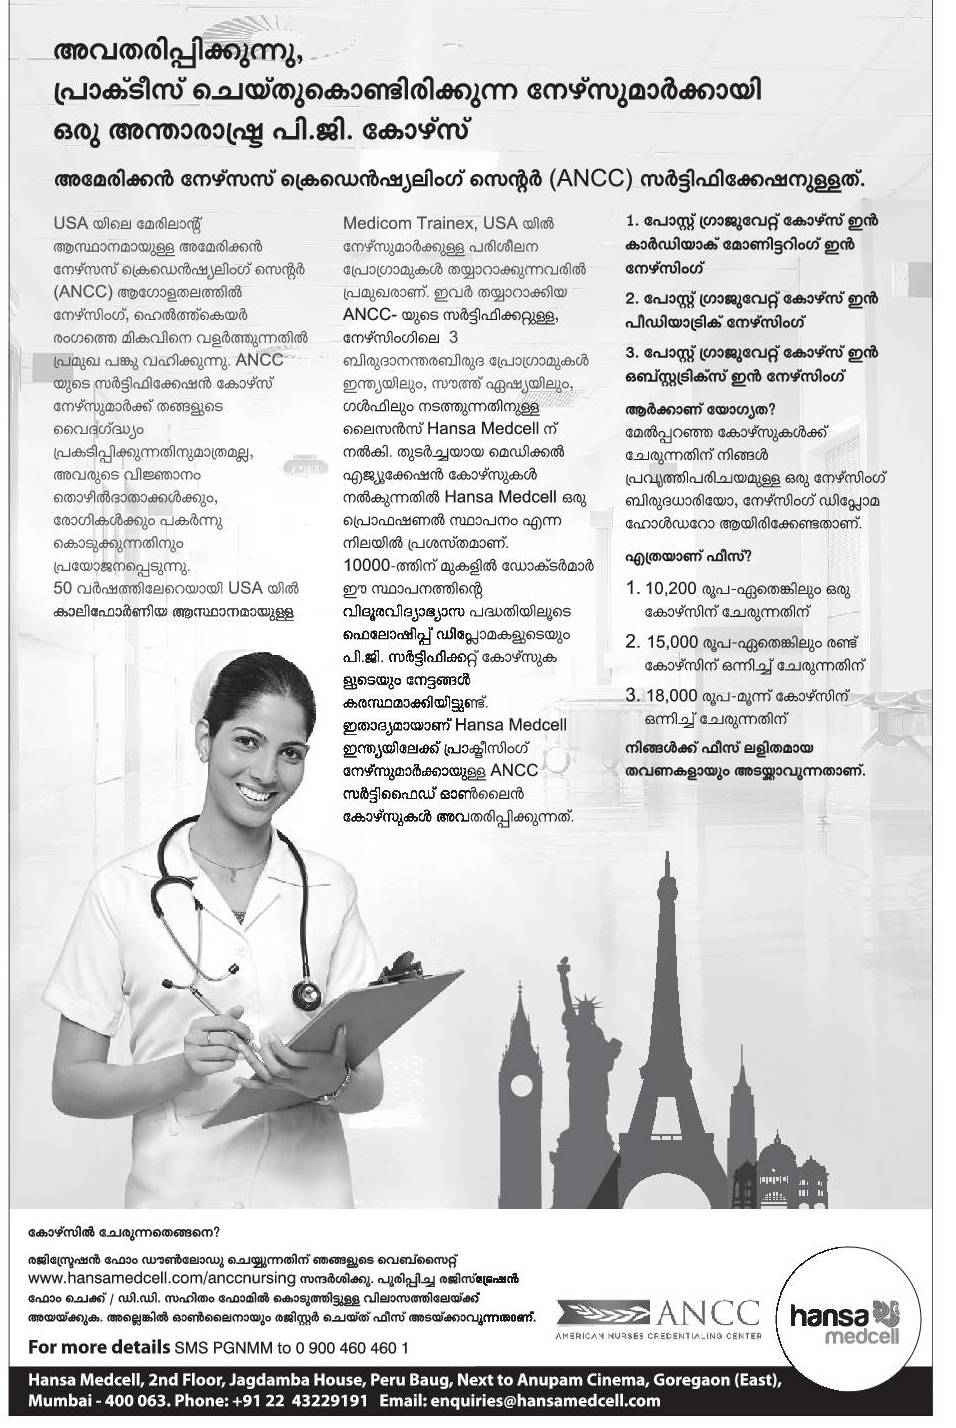 Ancc Certified Post Graduate Courses For Nurses July 2015 Nurses